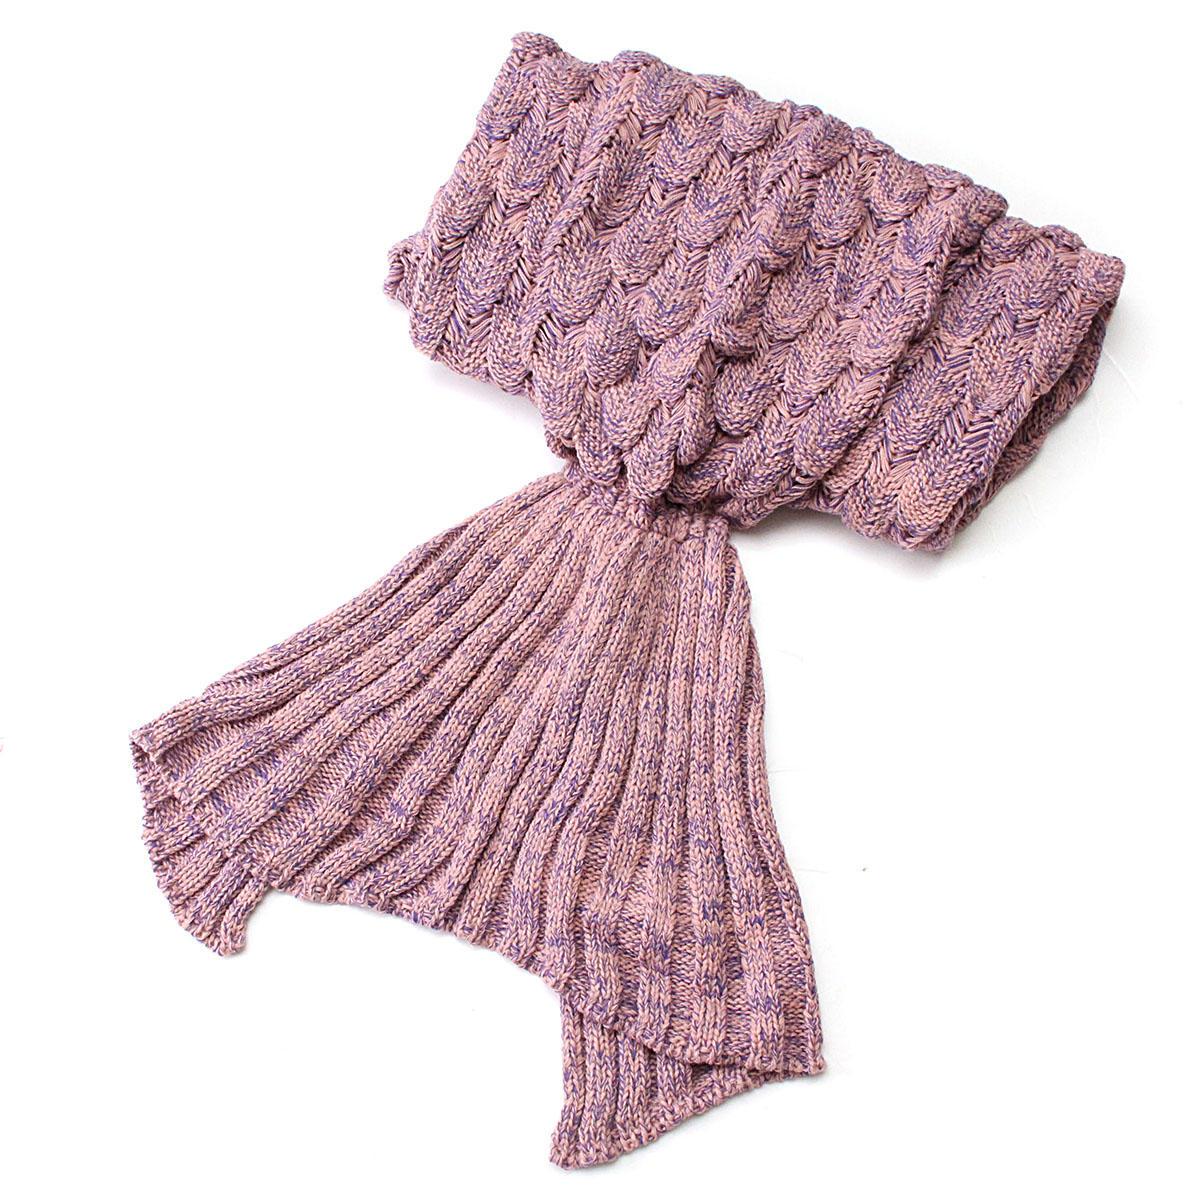 195x90cm Yarn Knitted Mermaid Tail Blankets Handmade Crochet Throw Super Soft Sofa Bed Mat - 4